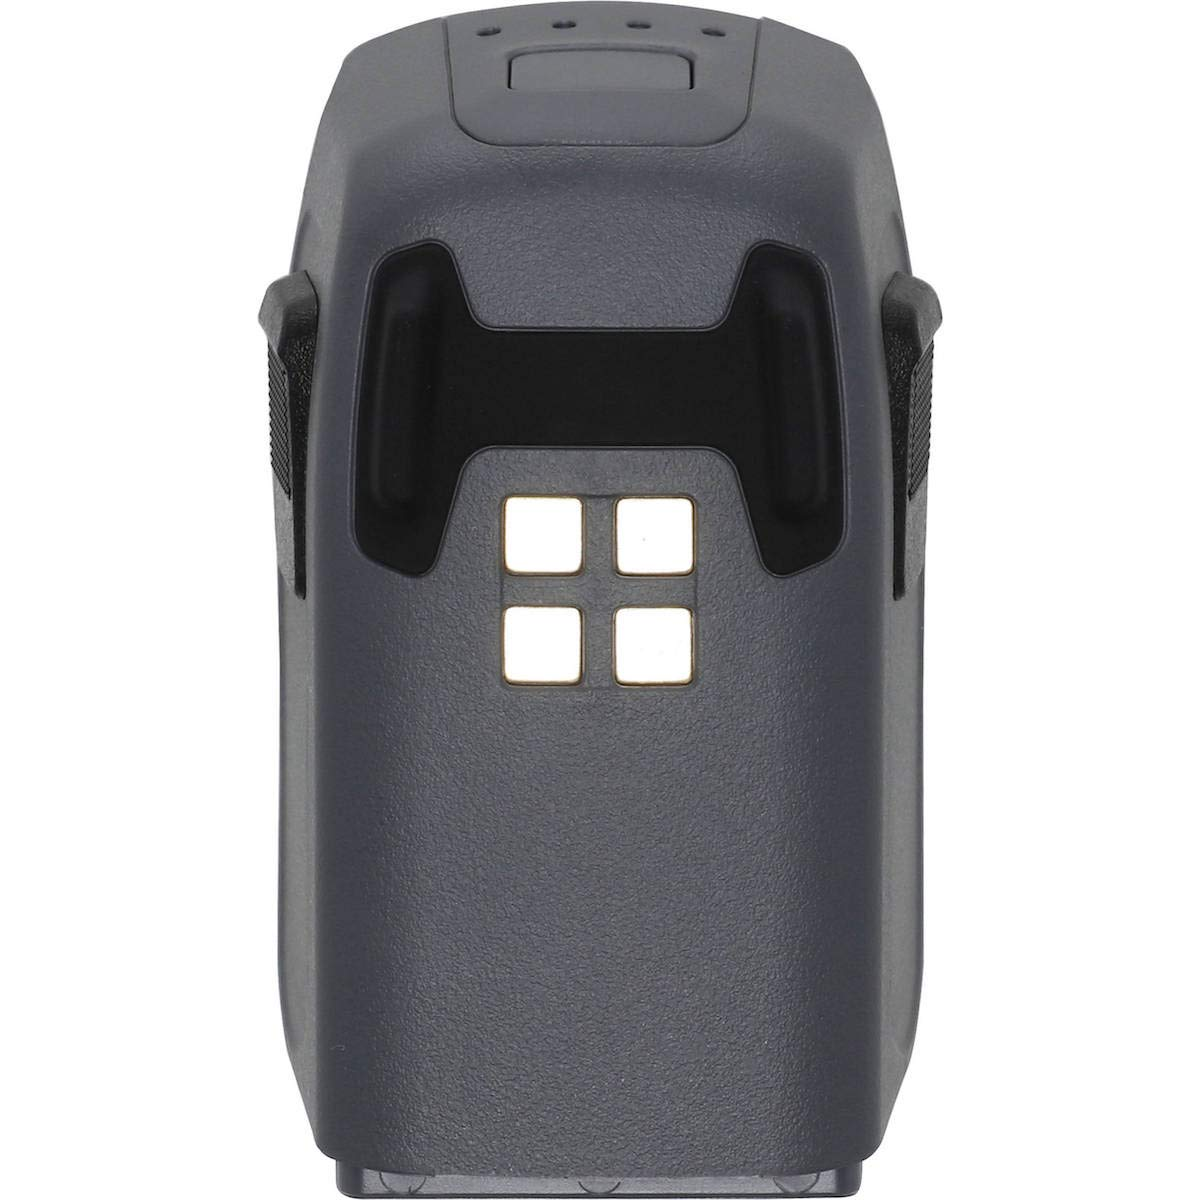 Bateria Original Dji Para Drone Dji Spark - Negra (xsr)